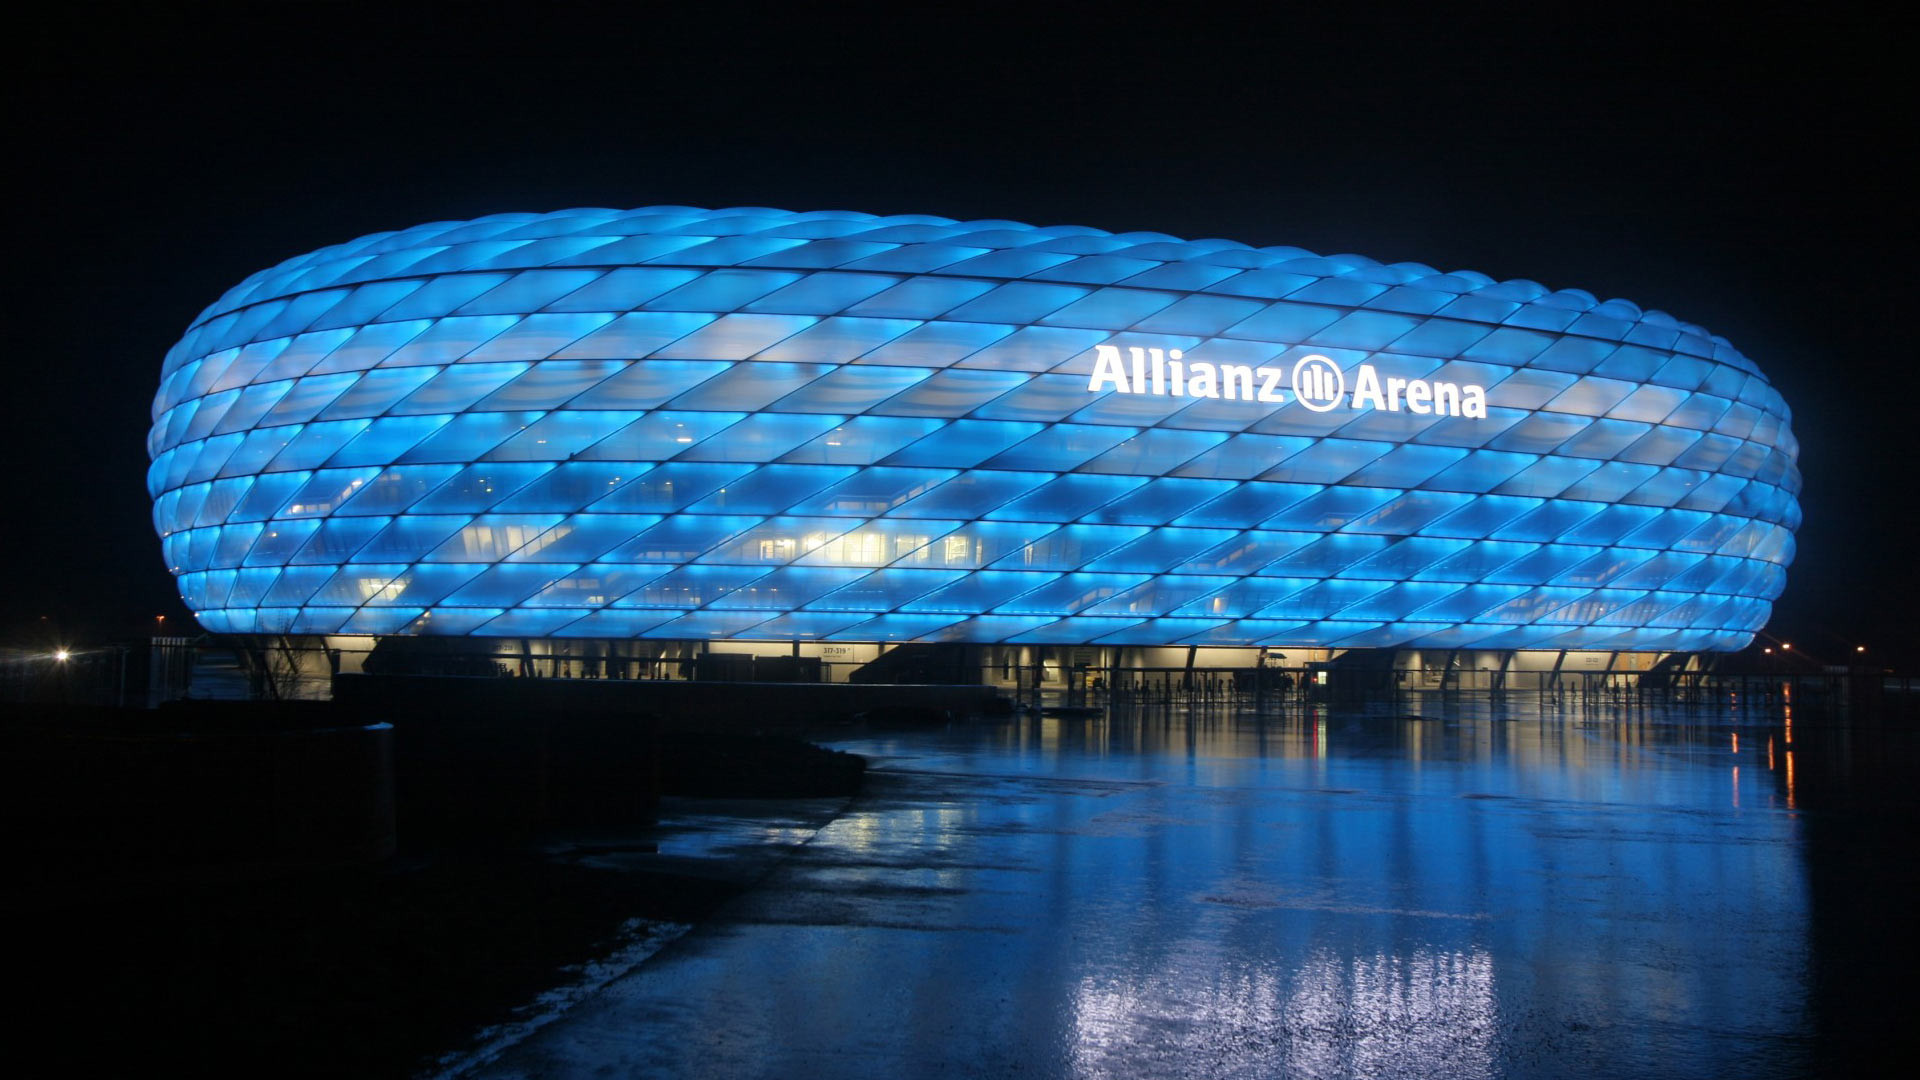 Bayern Munich Allianz Arena Wallpapers